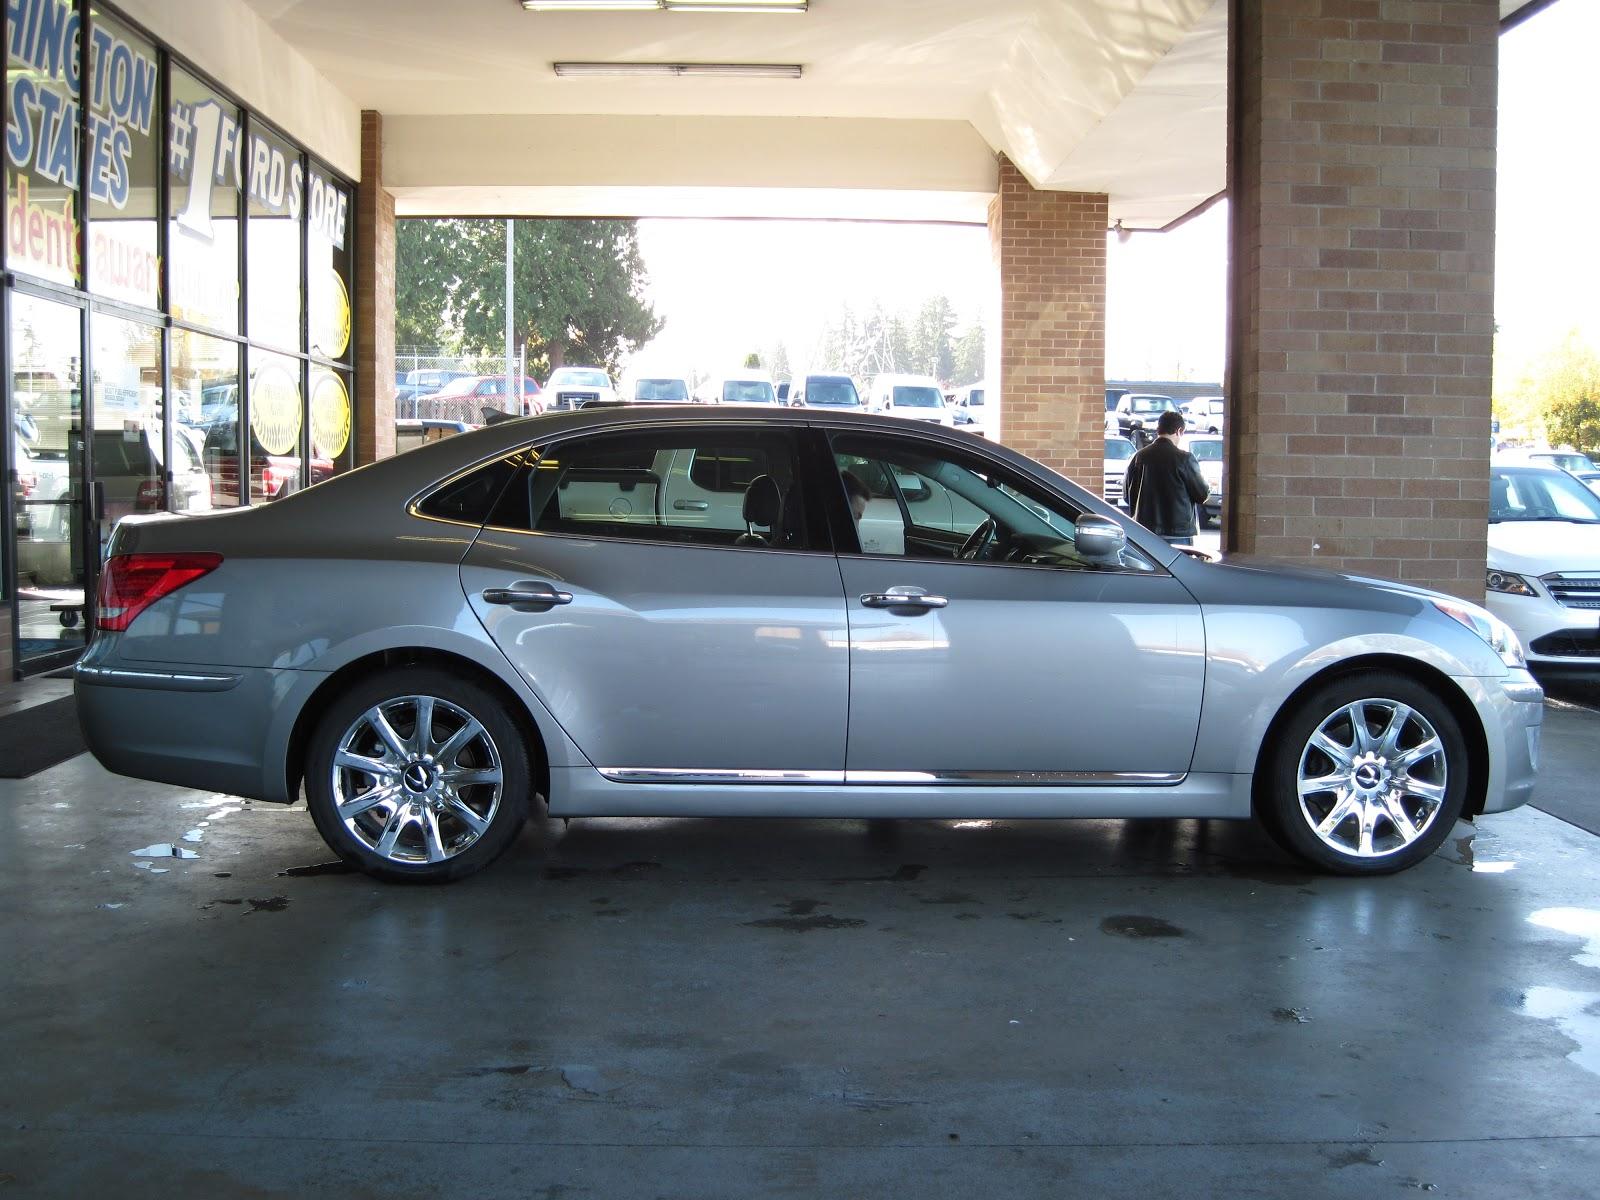 Kirkland Cars And Internet Sales Hyundai Equus Will Be